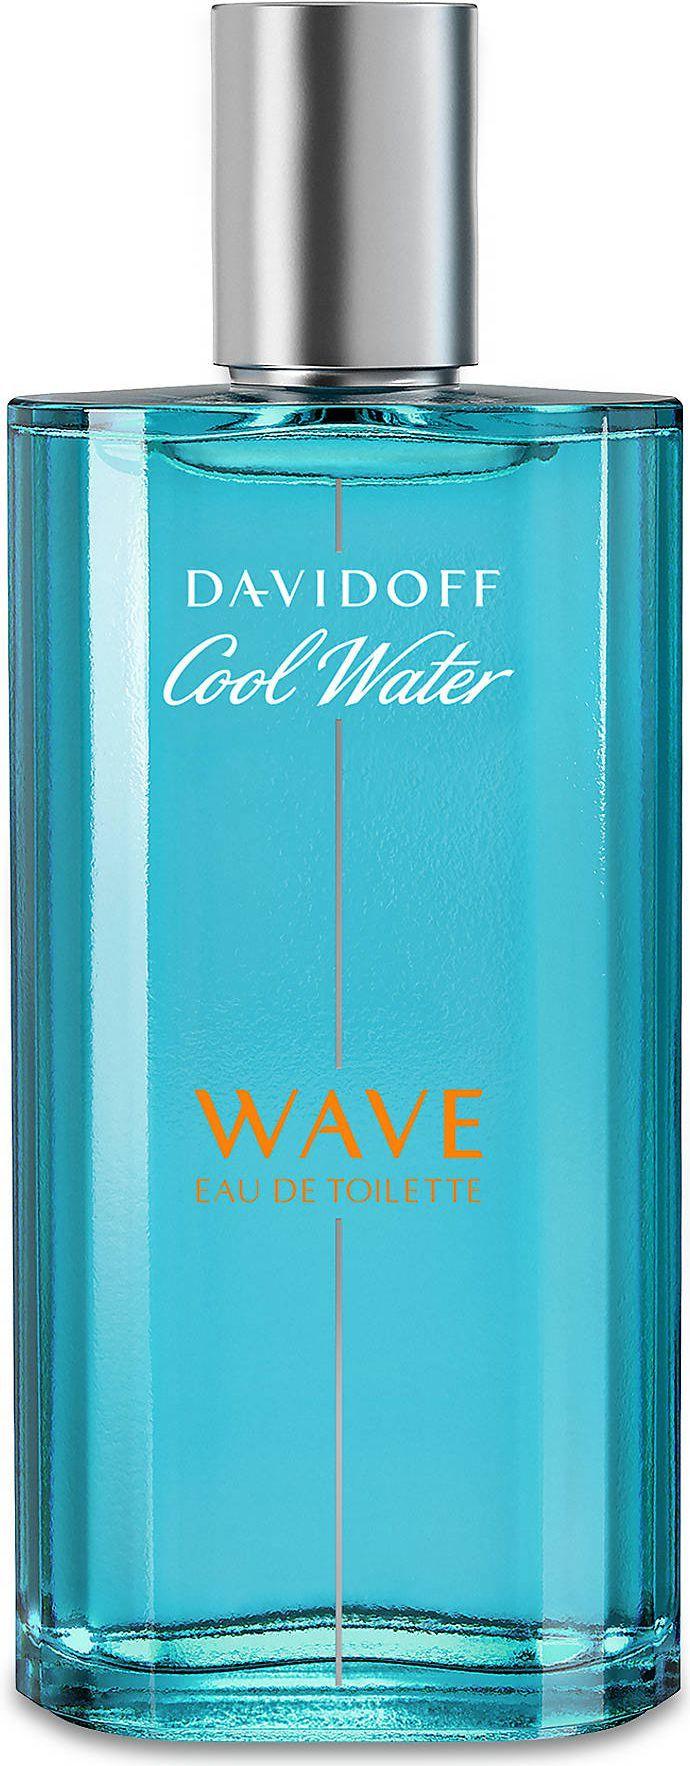 Davidoff Cool Water Wave EDT 40ml 1